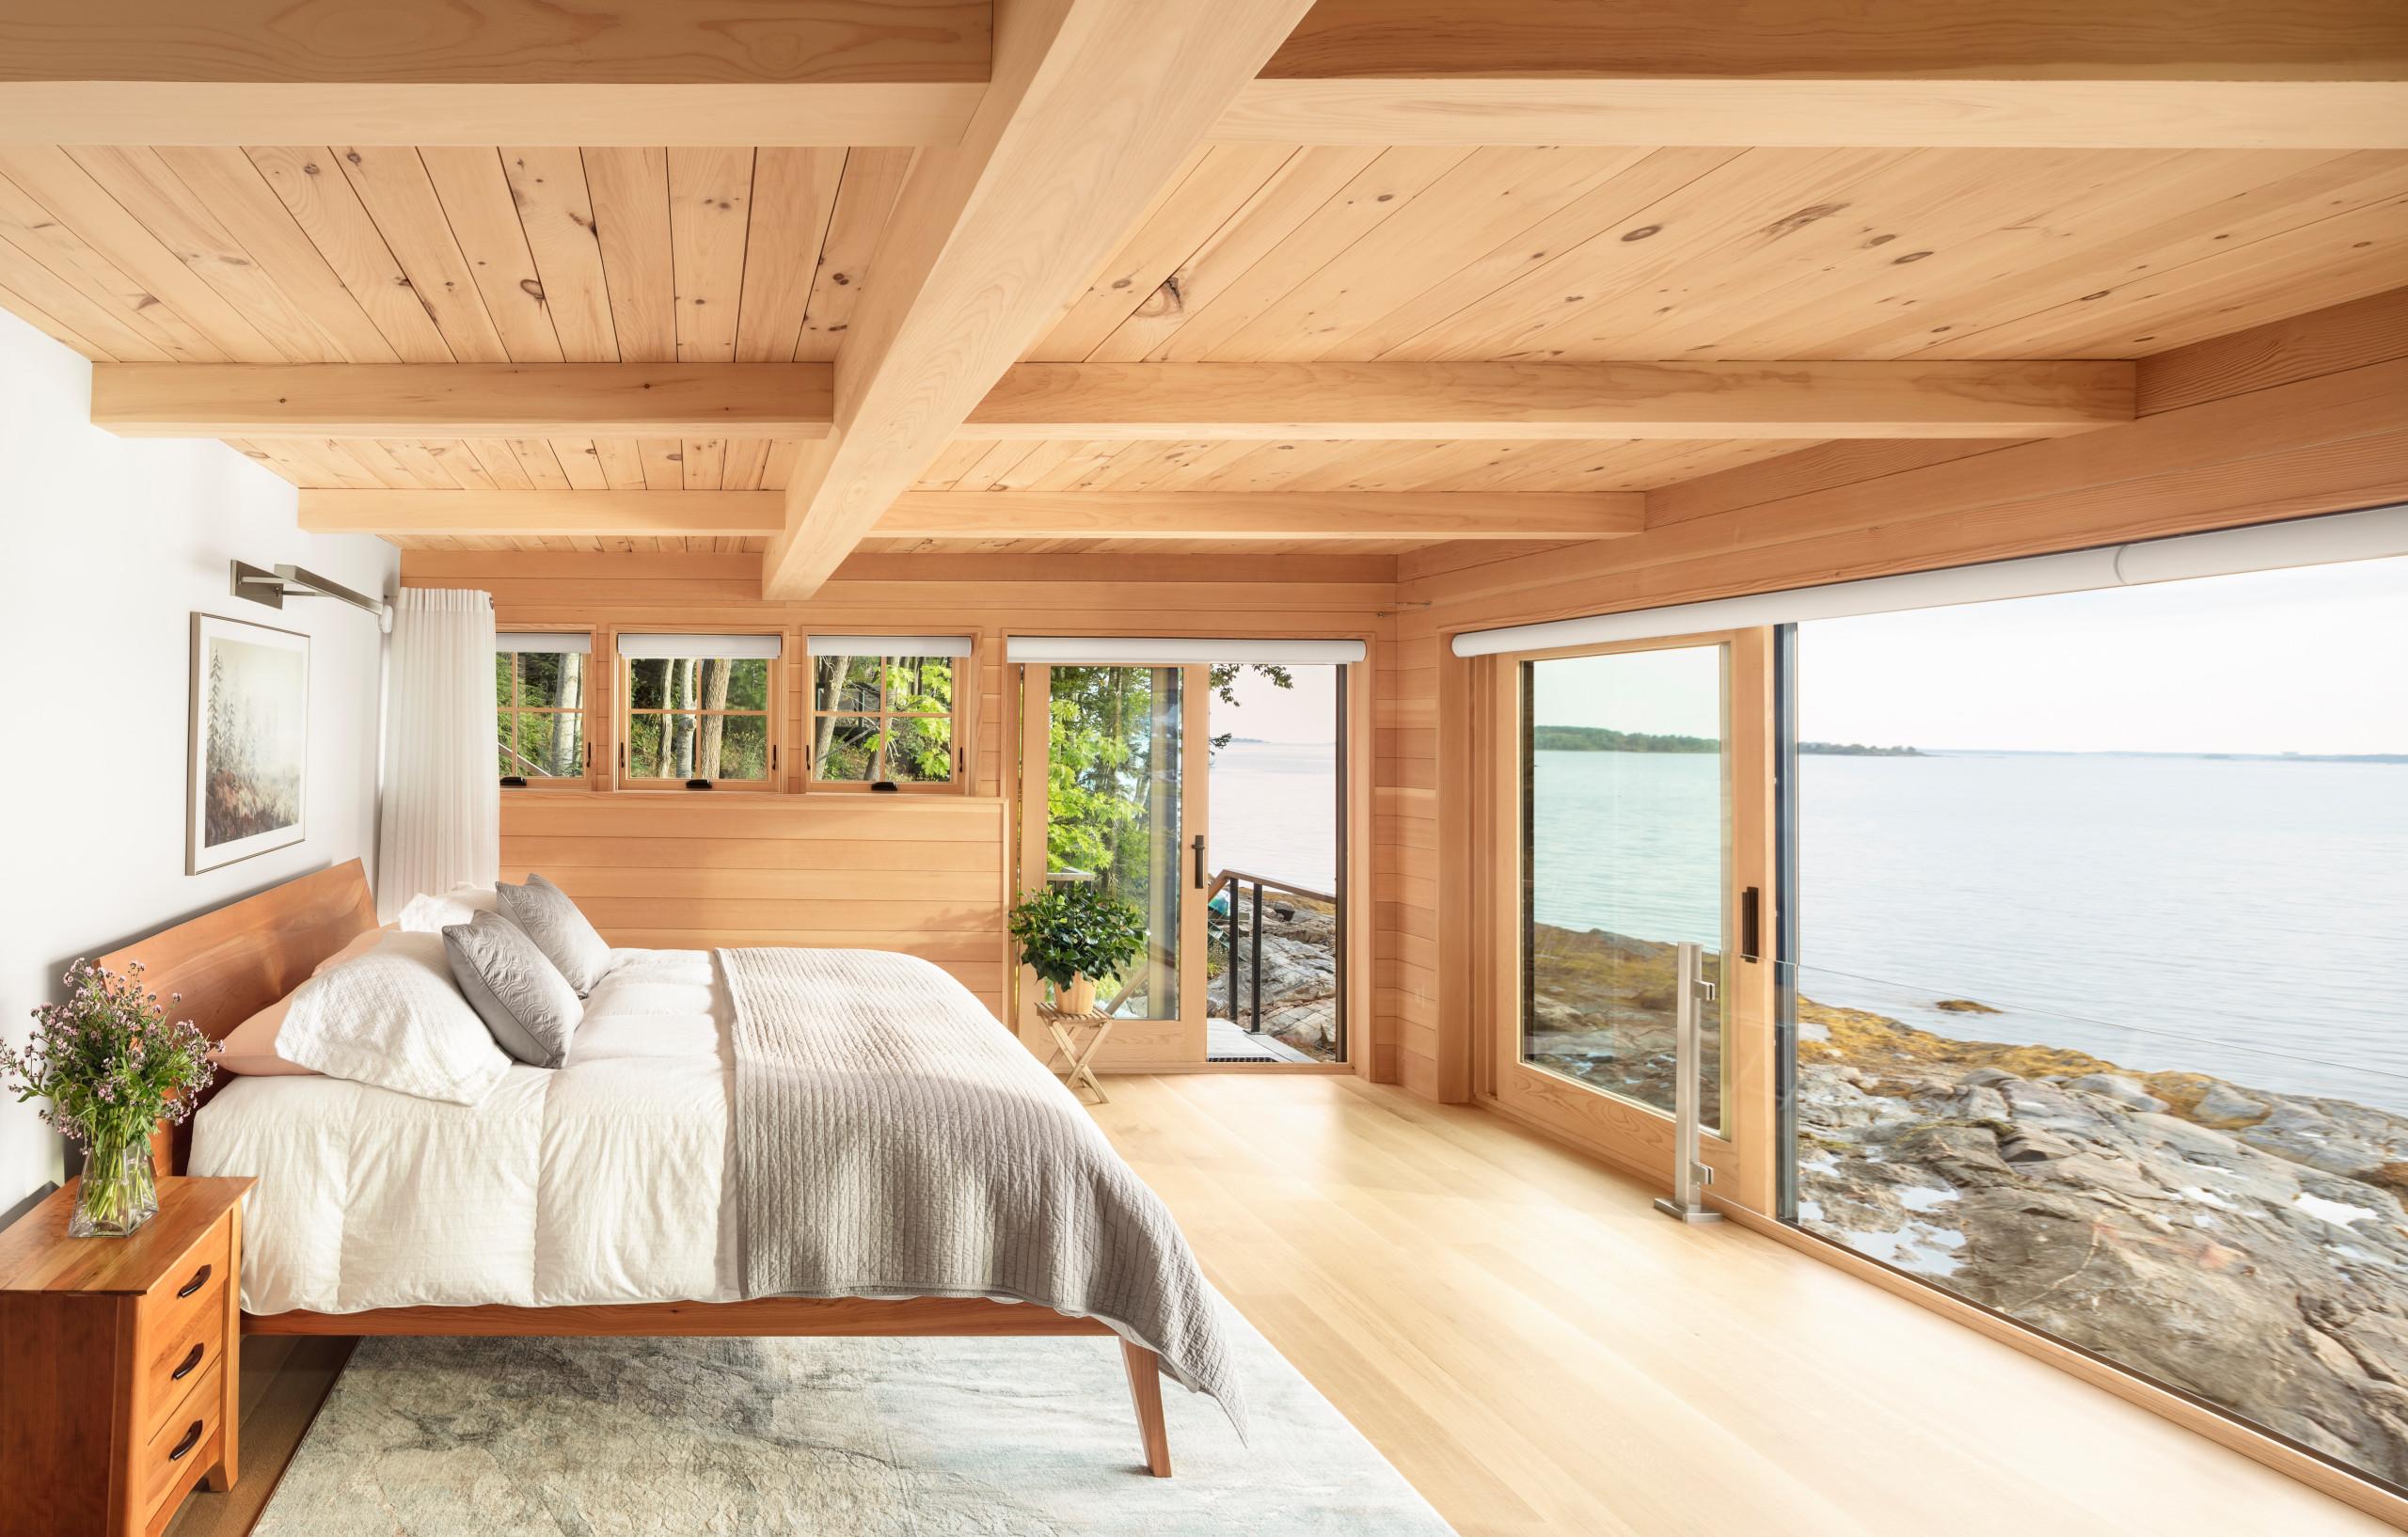 75 Beautiful Orange Bedroom Pictures Ideas November 2020 Houzz